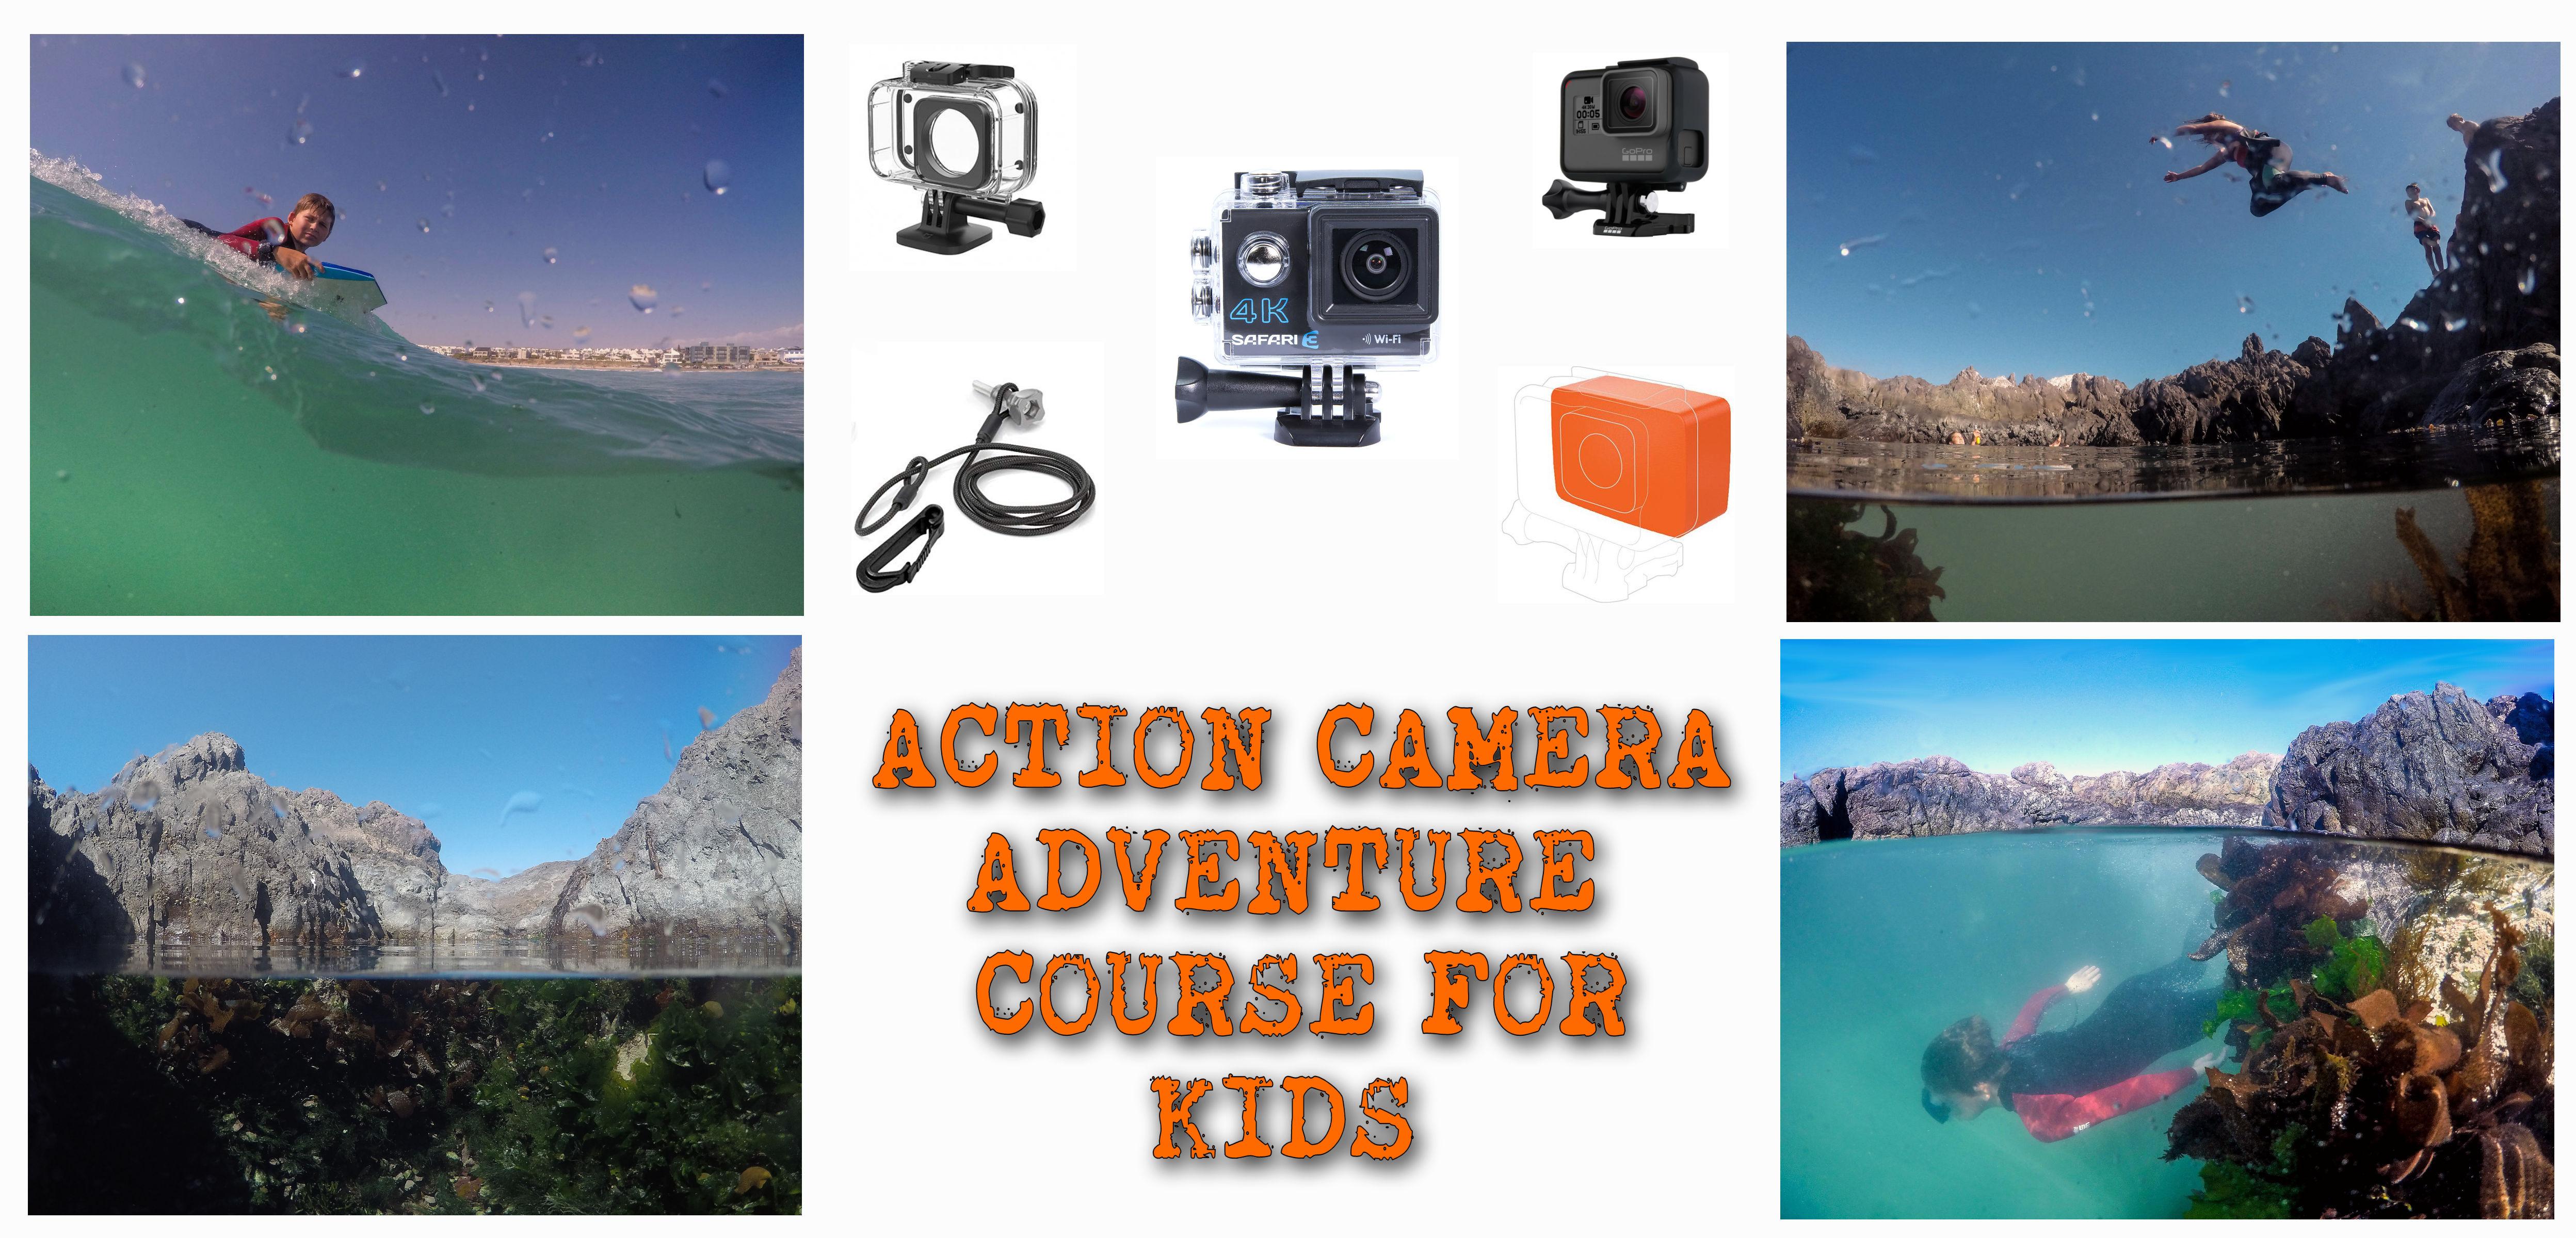 Action Camera Course